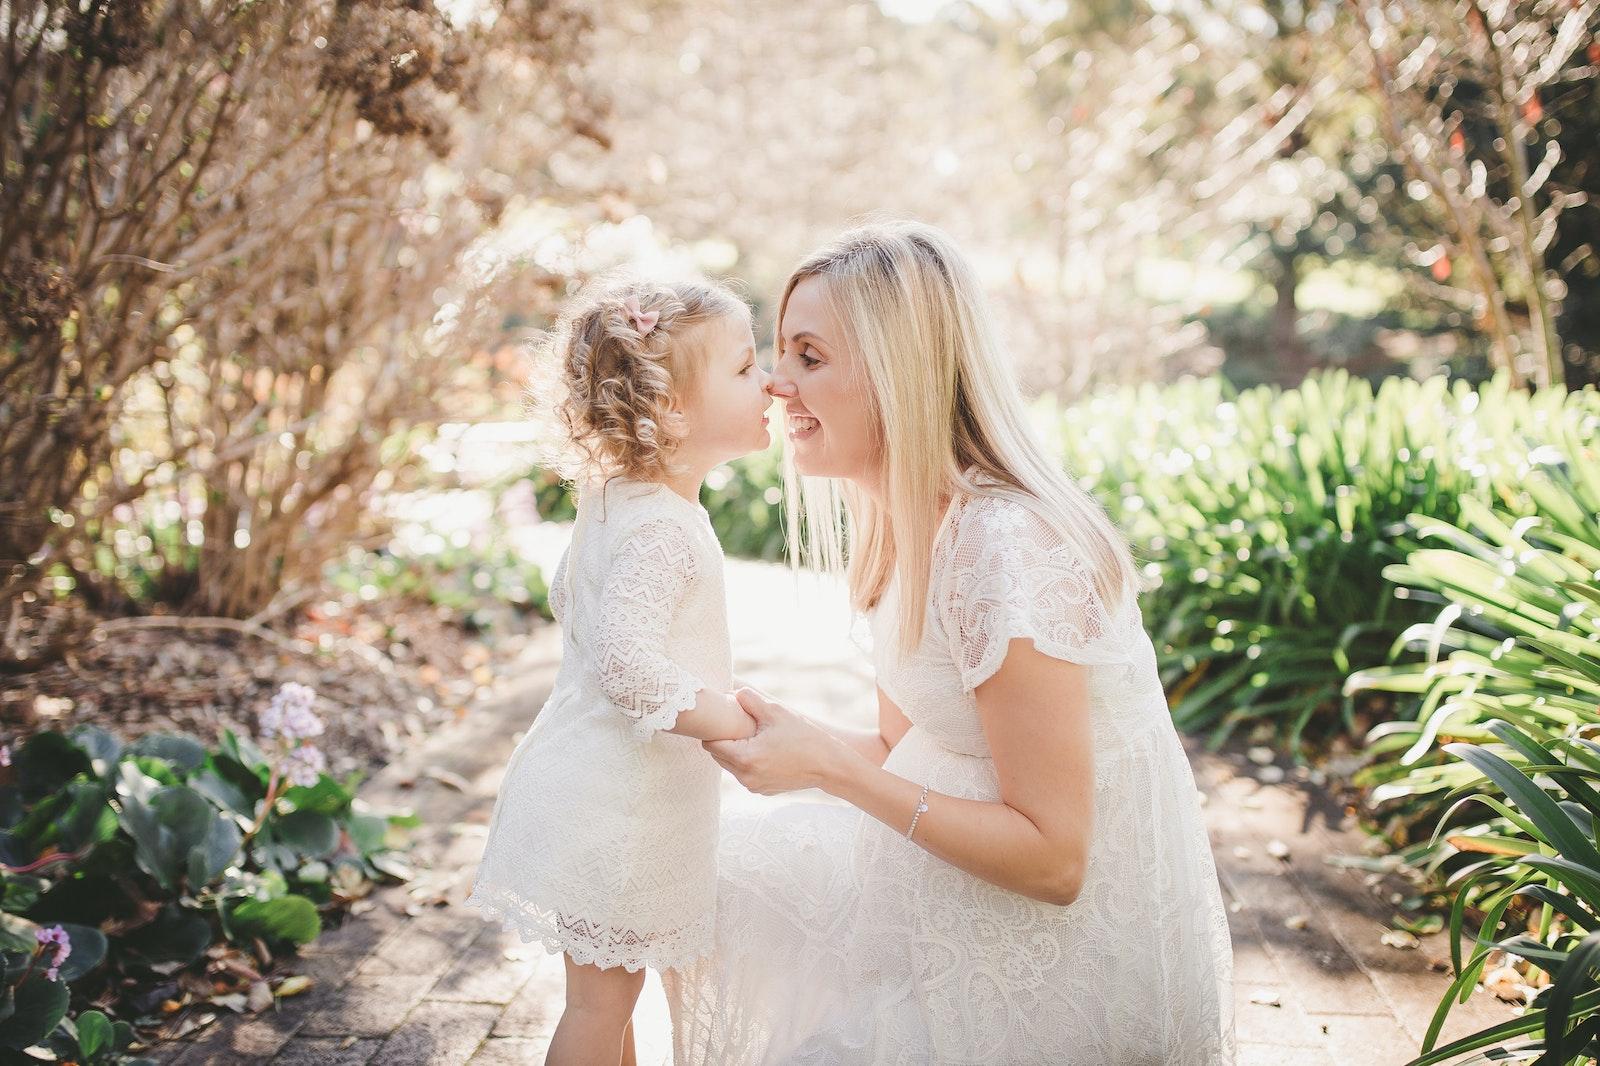 Maternity Photoshoot Wollongong Bump to Bounce Photography-7